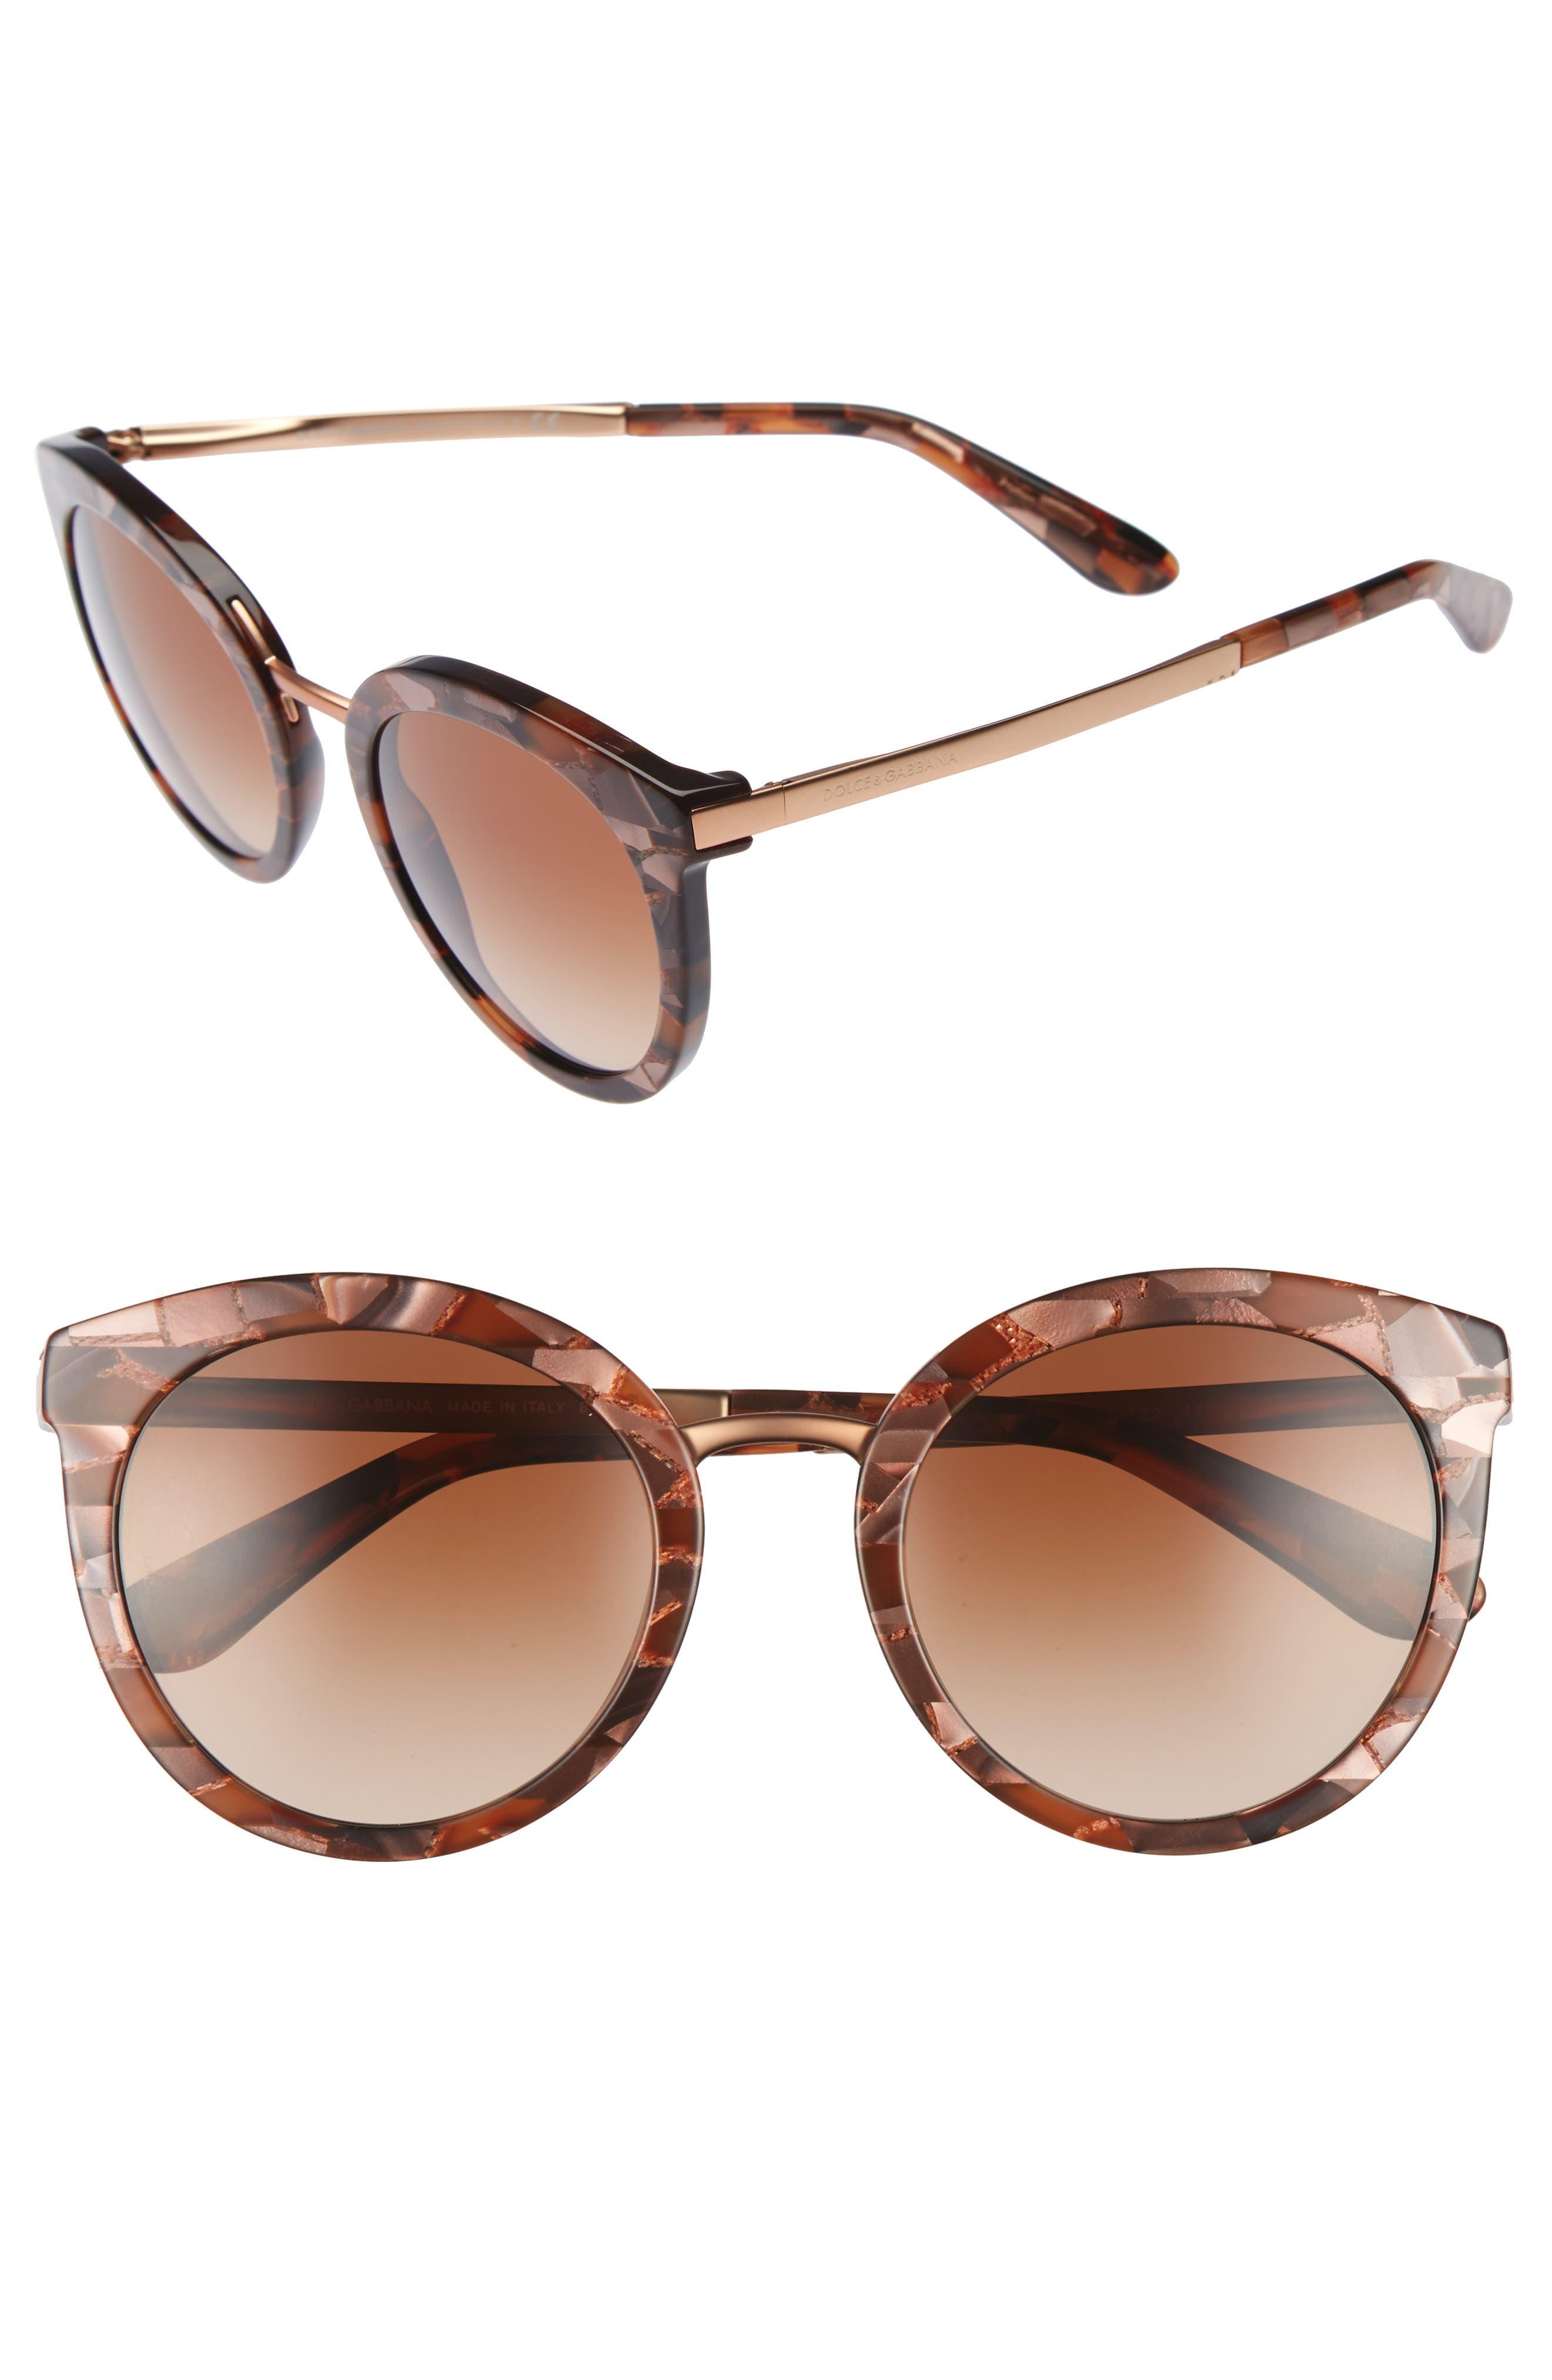 52mm Round Sunglasses,                         Main,                         color, 220